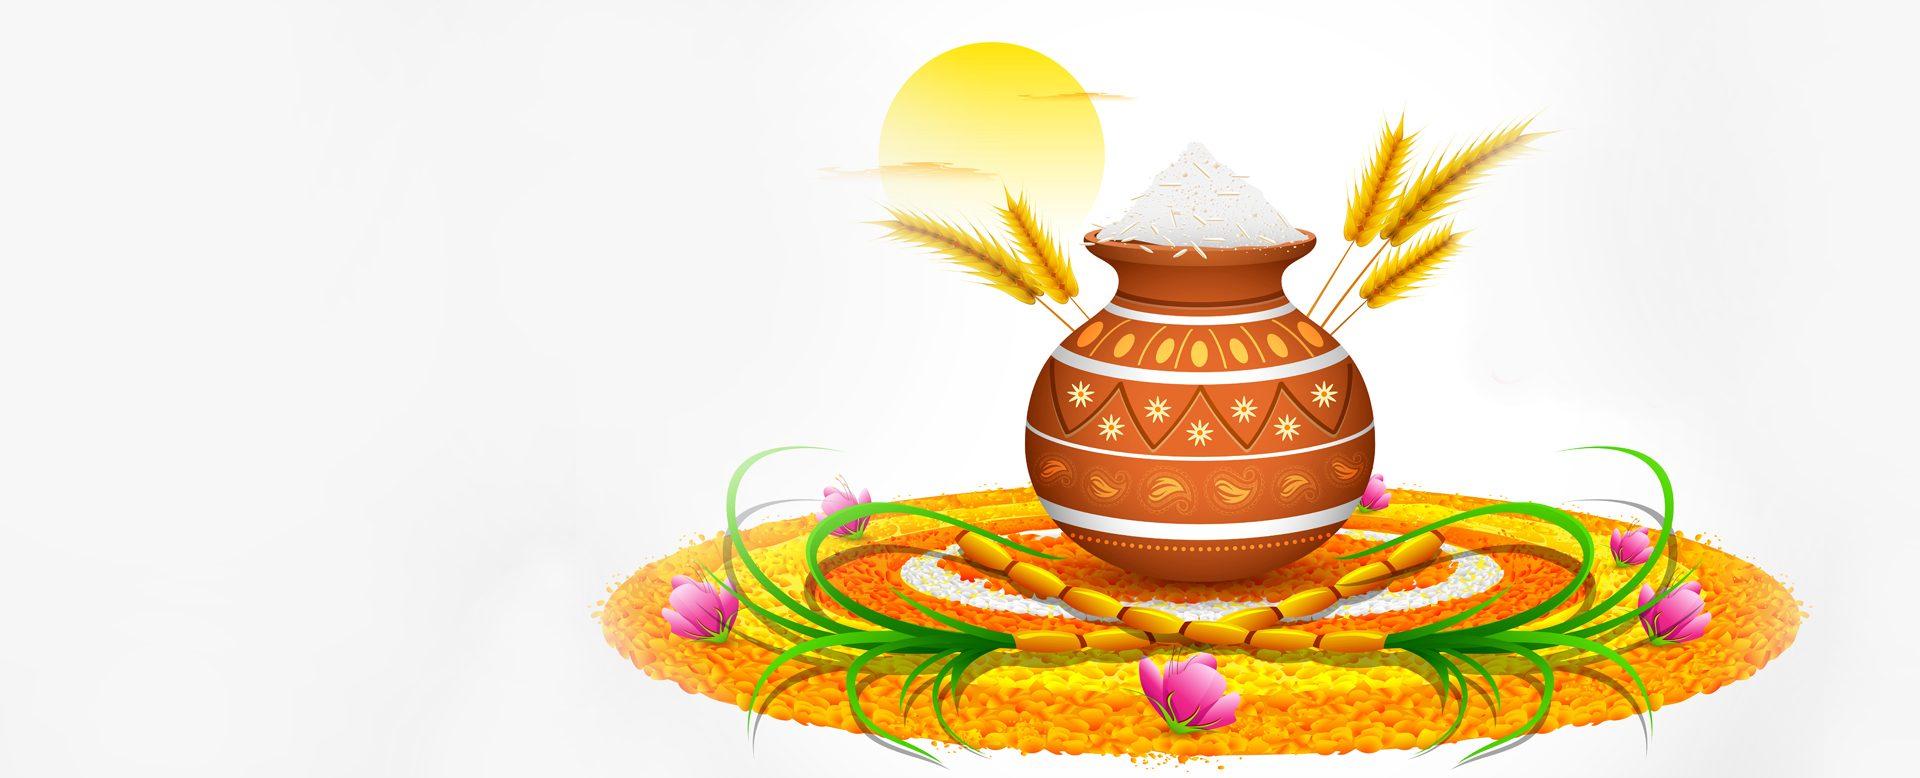 Wishing You & Your Family a Very Happy Pongal & Makar Sankranti